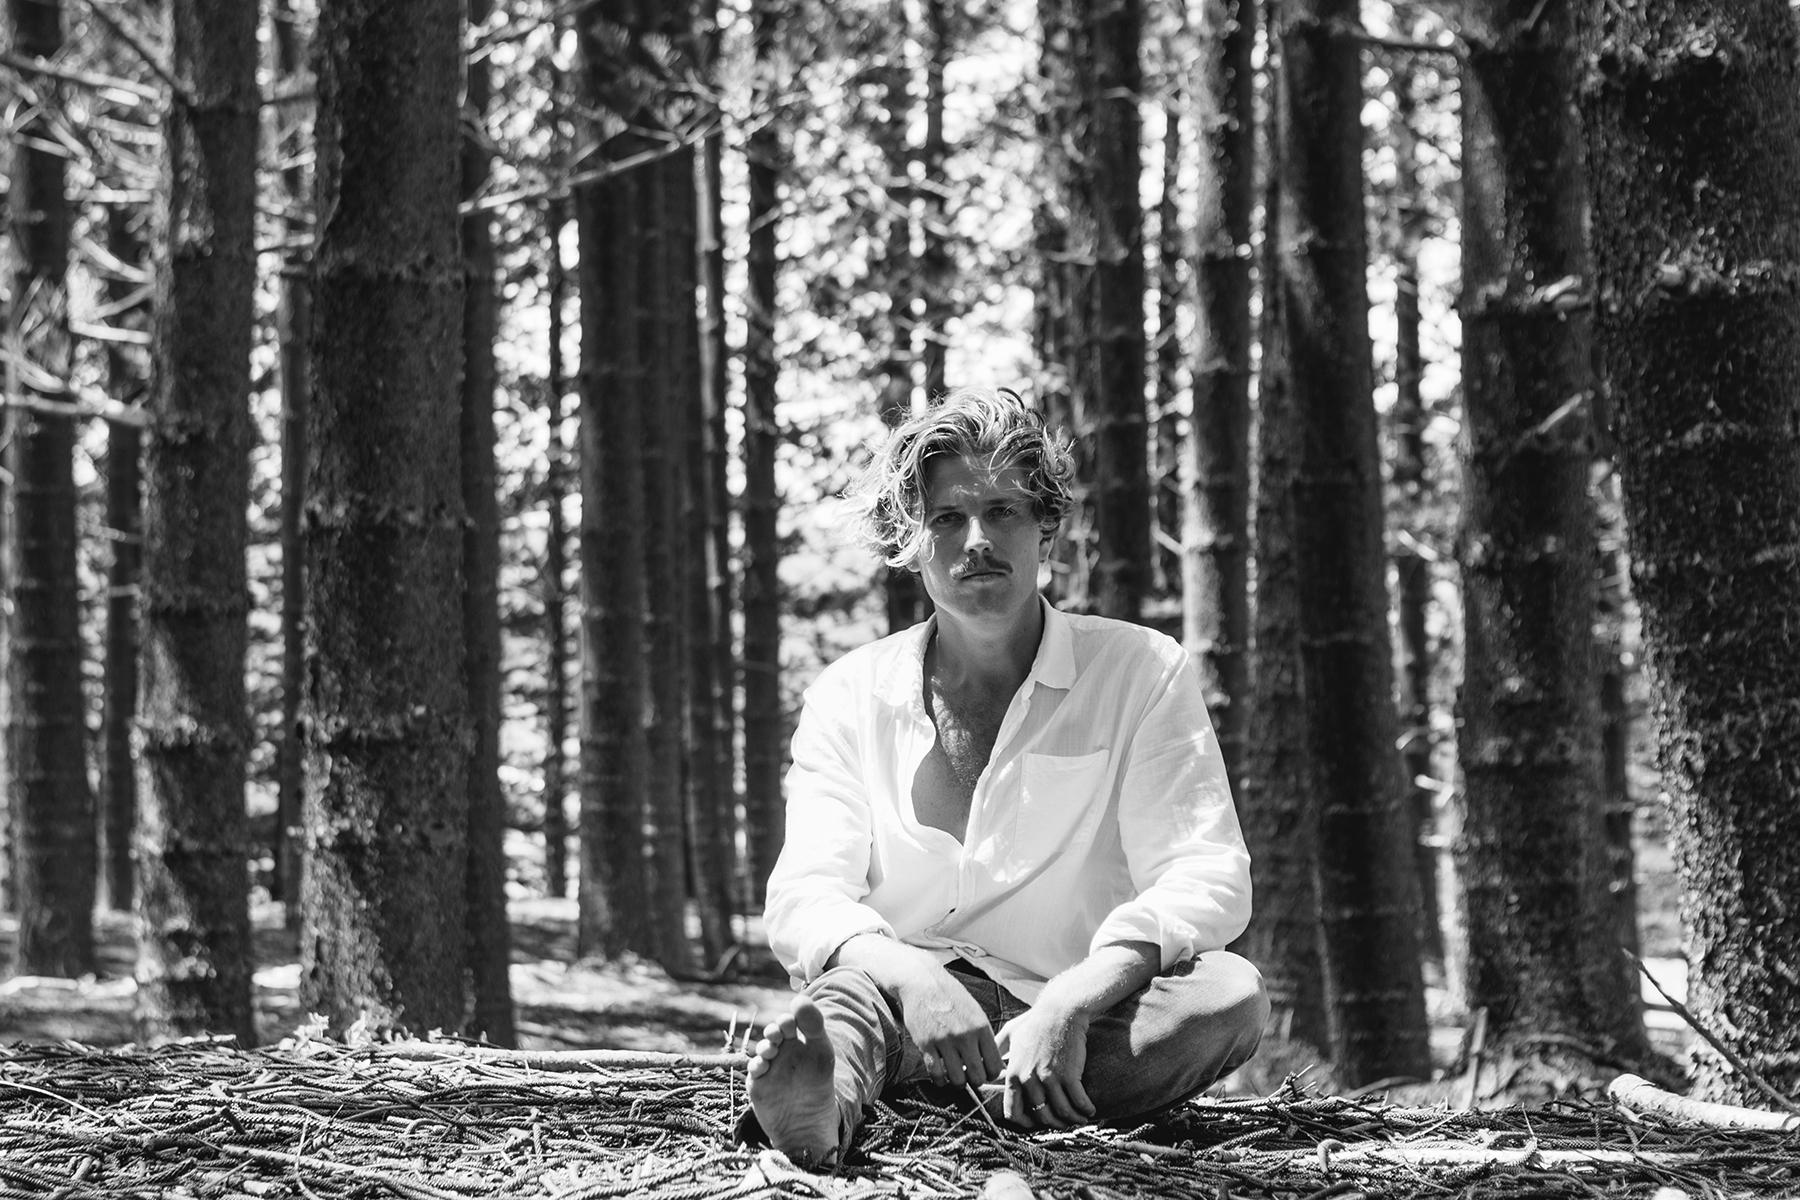 Ziggy Alberts Press Image - Photographer Zach Sanders @stuckonarockphoto.jpg